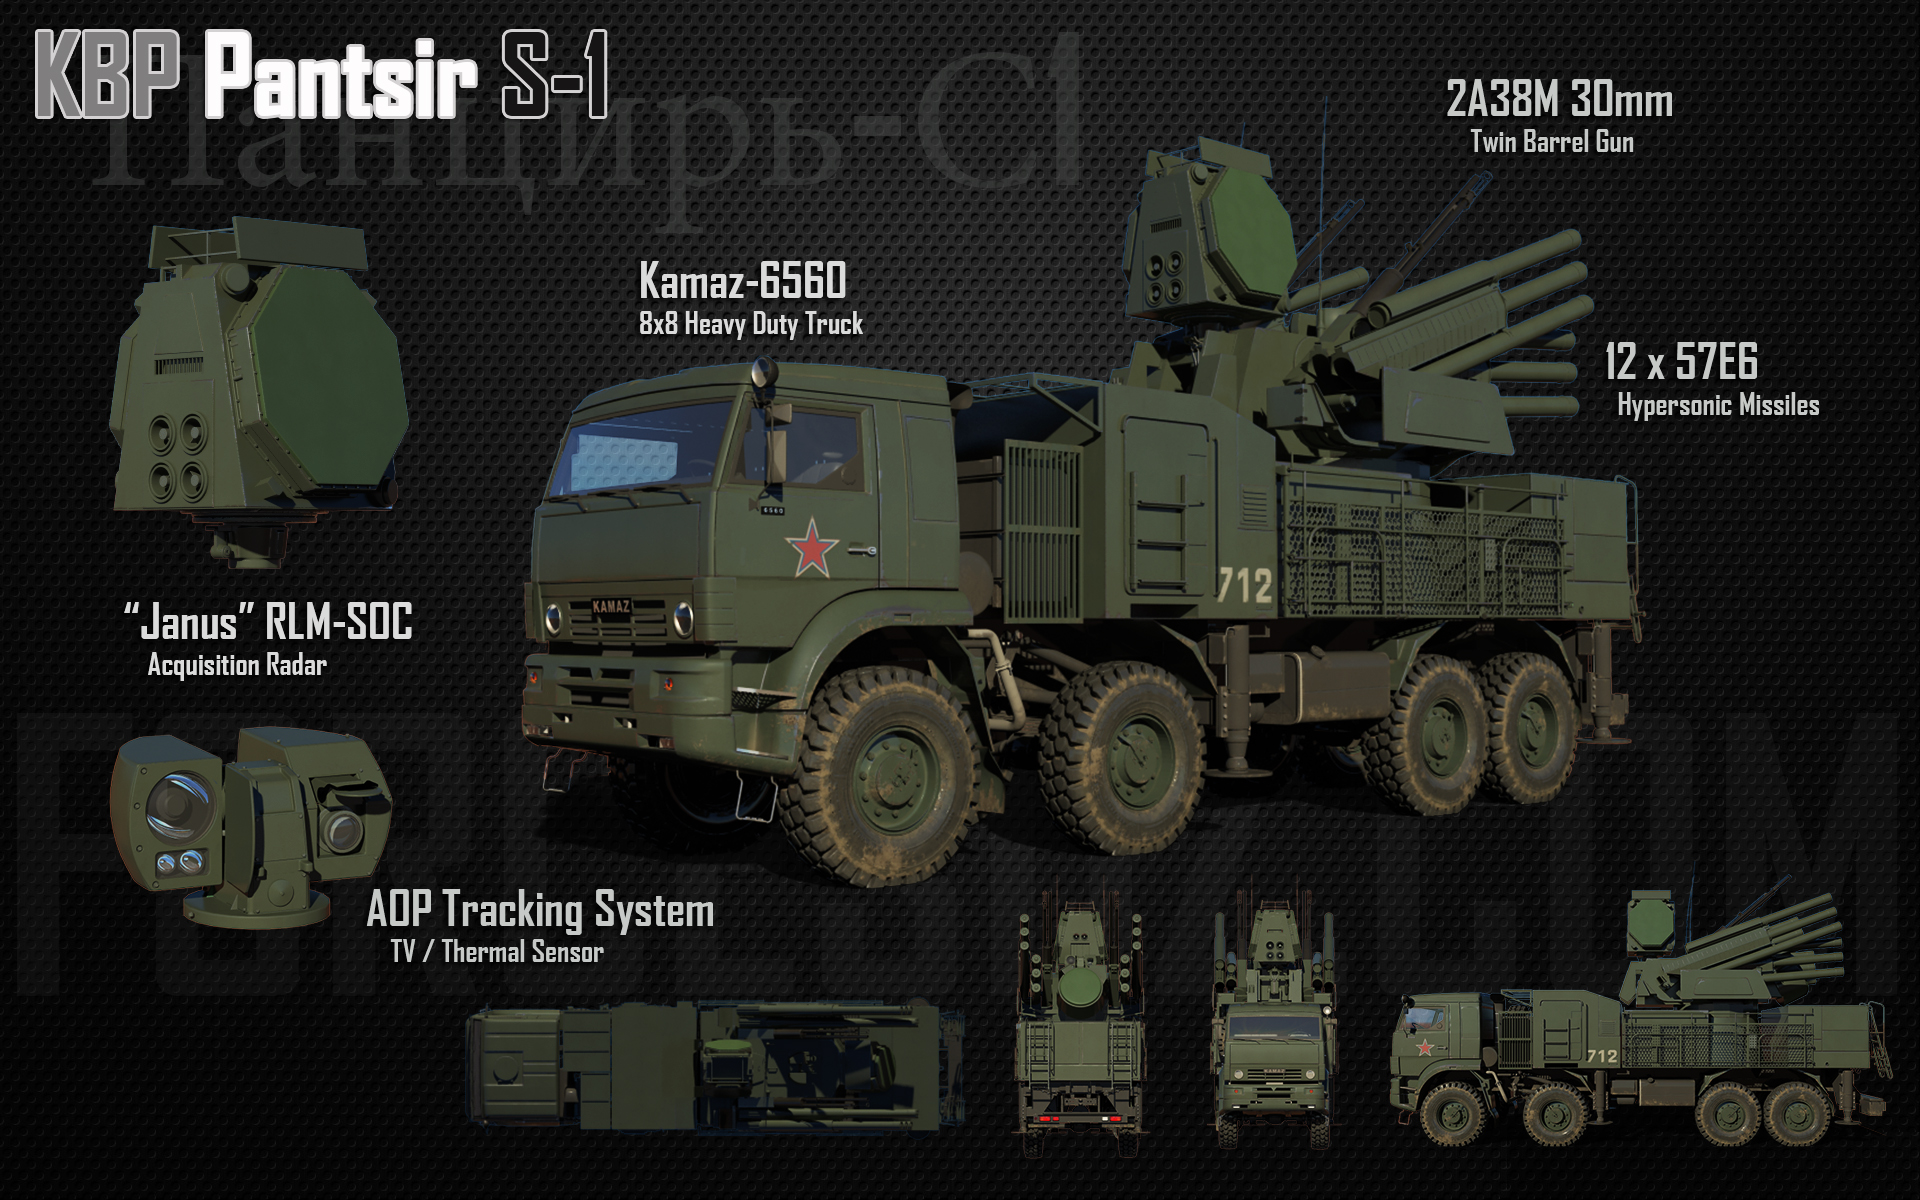 Pantsir-S1, o novo sistema de defesa aérea do Brasil?